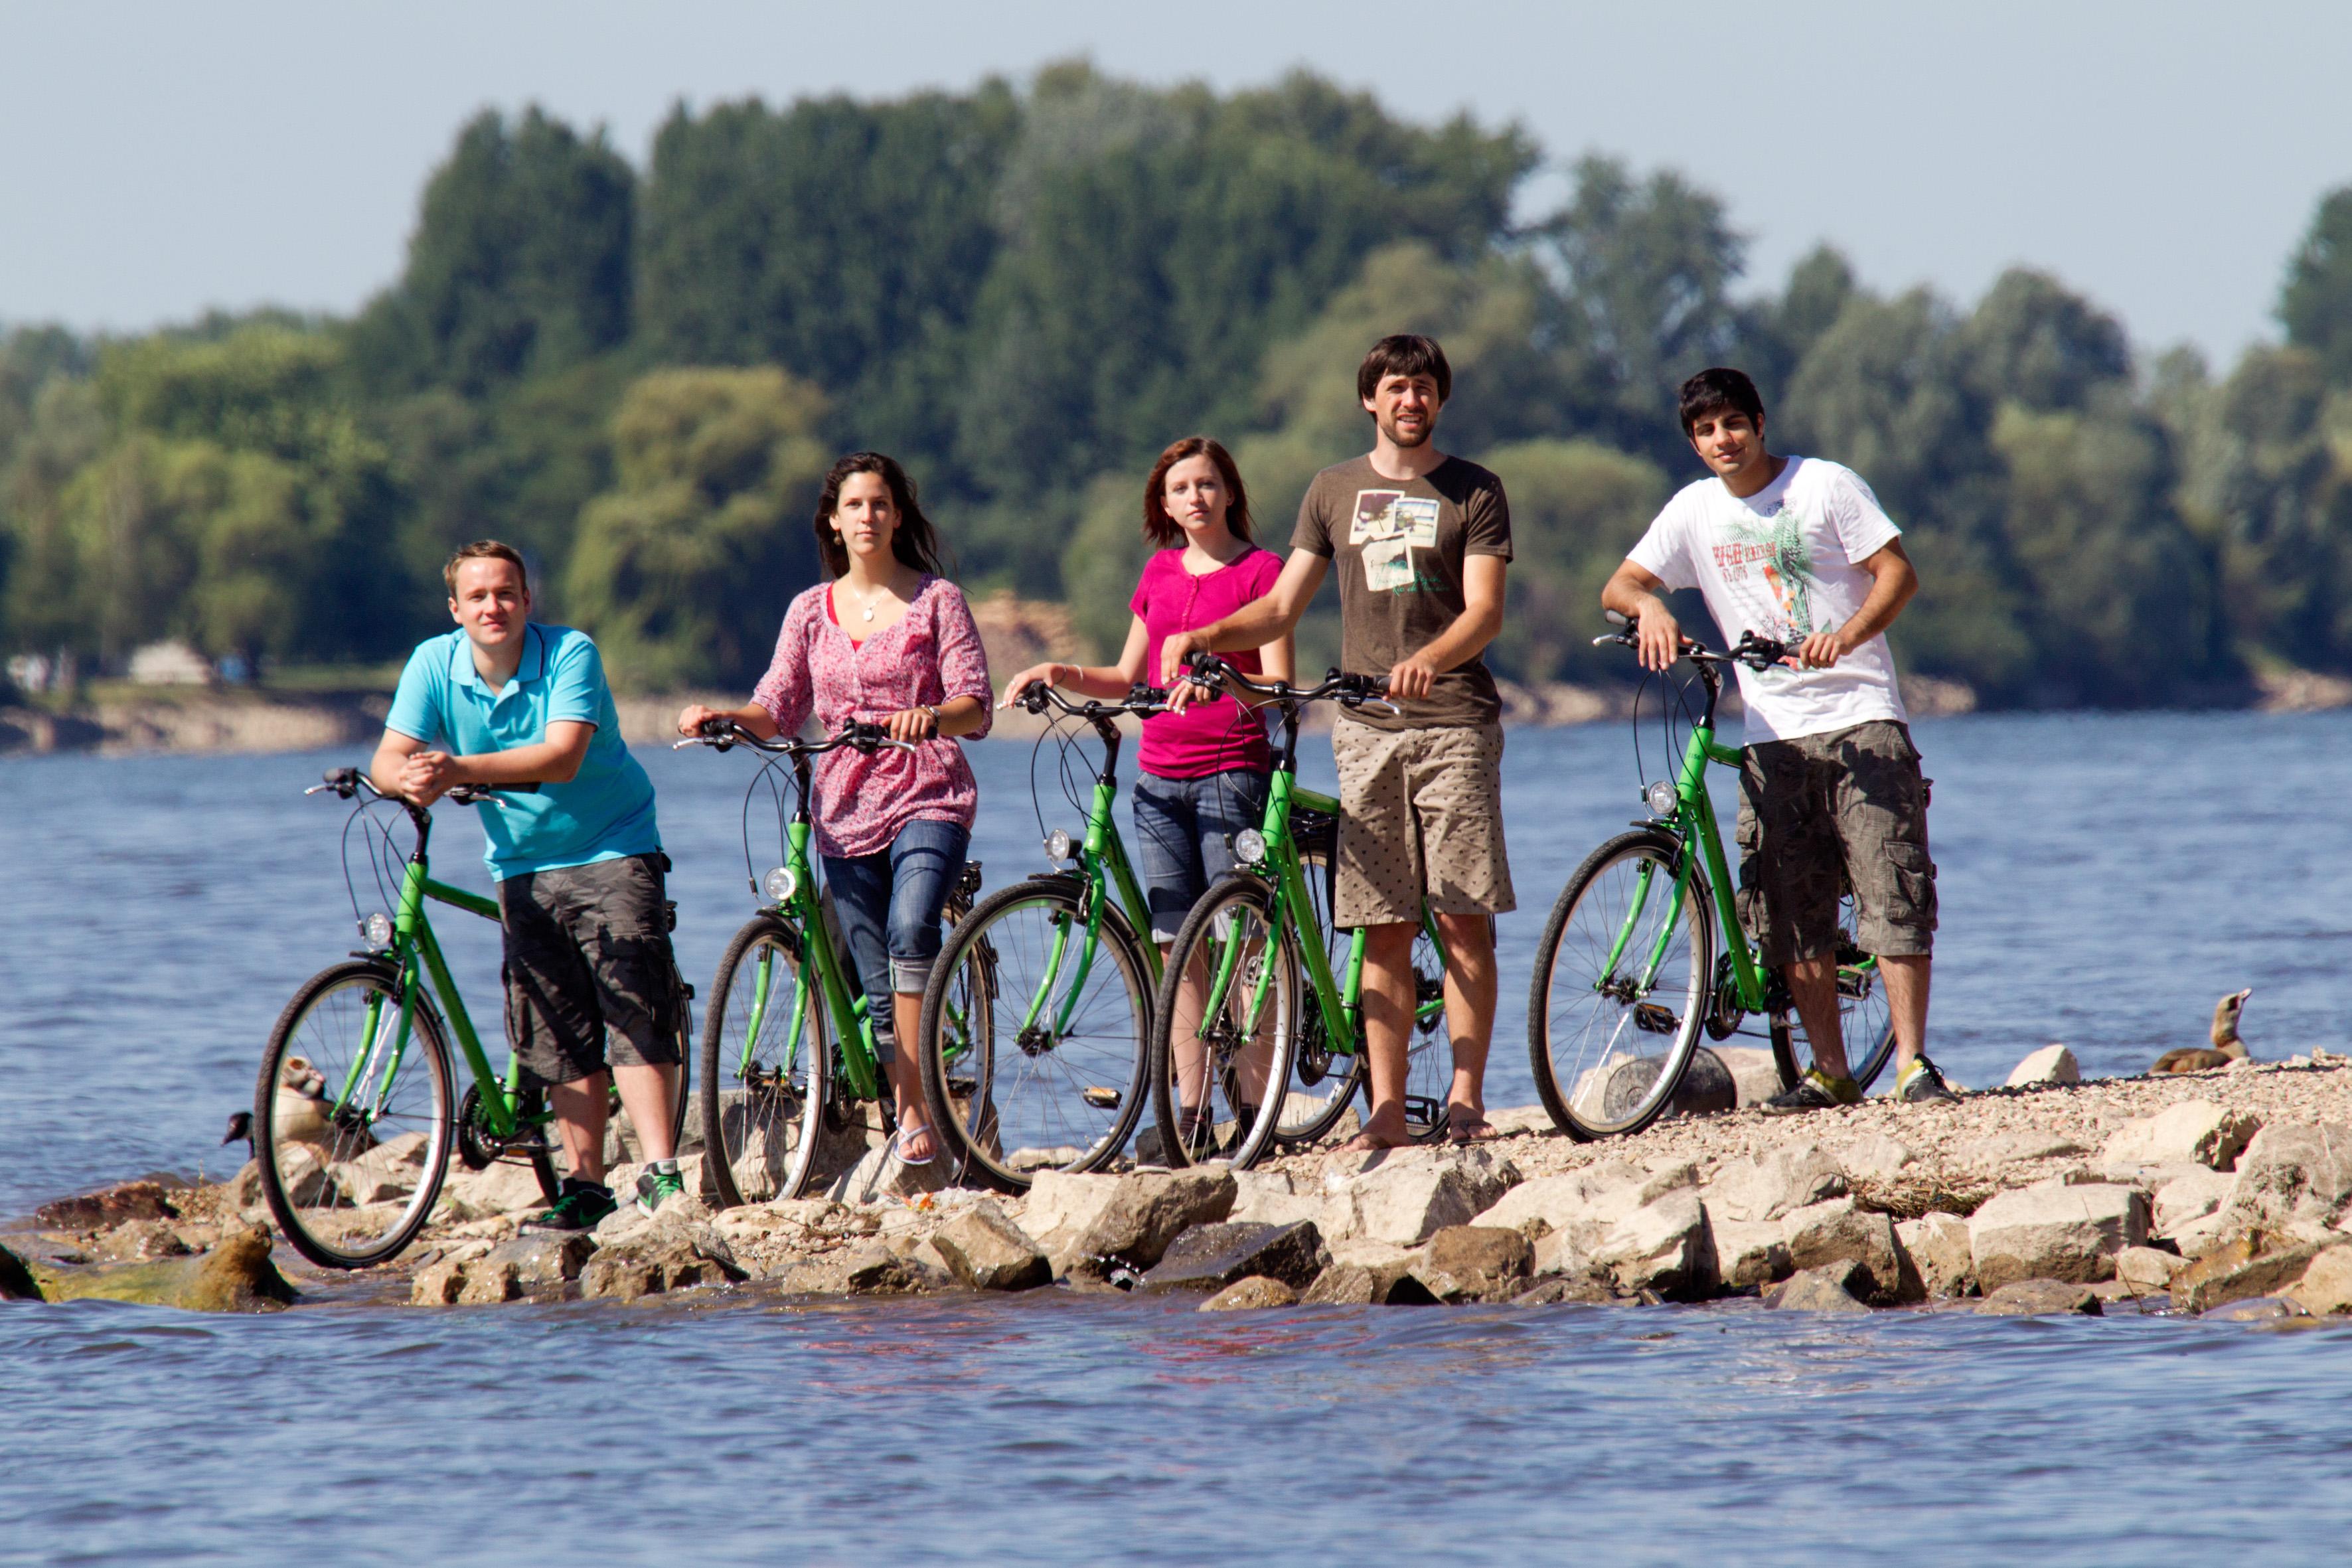 Rhein-Fotoshooting-2011-049